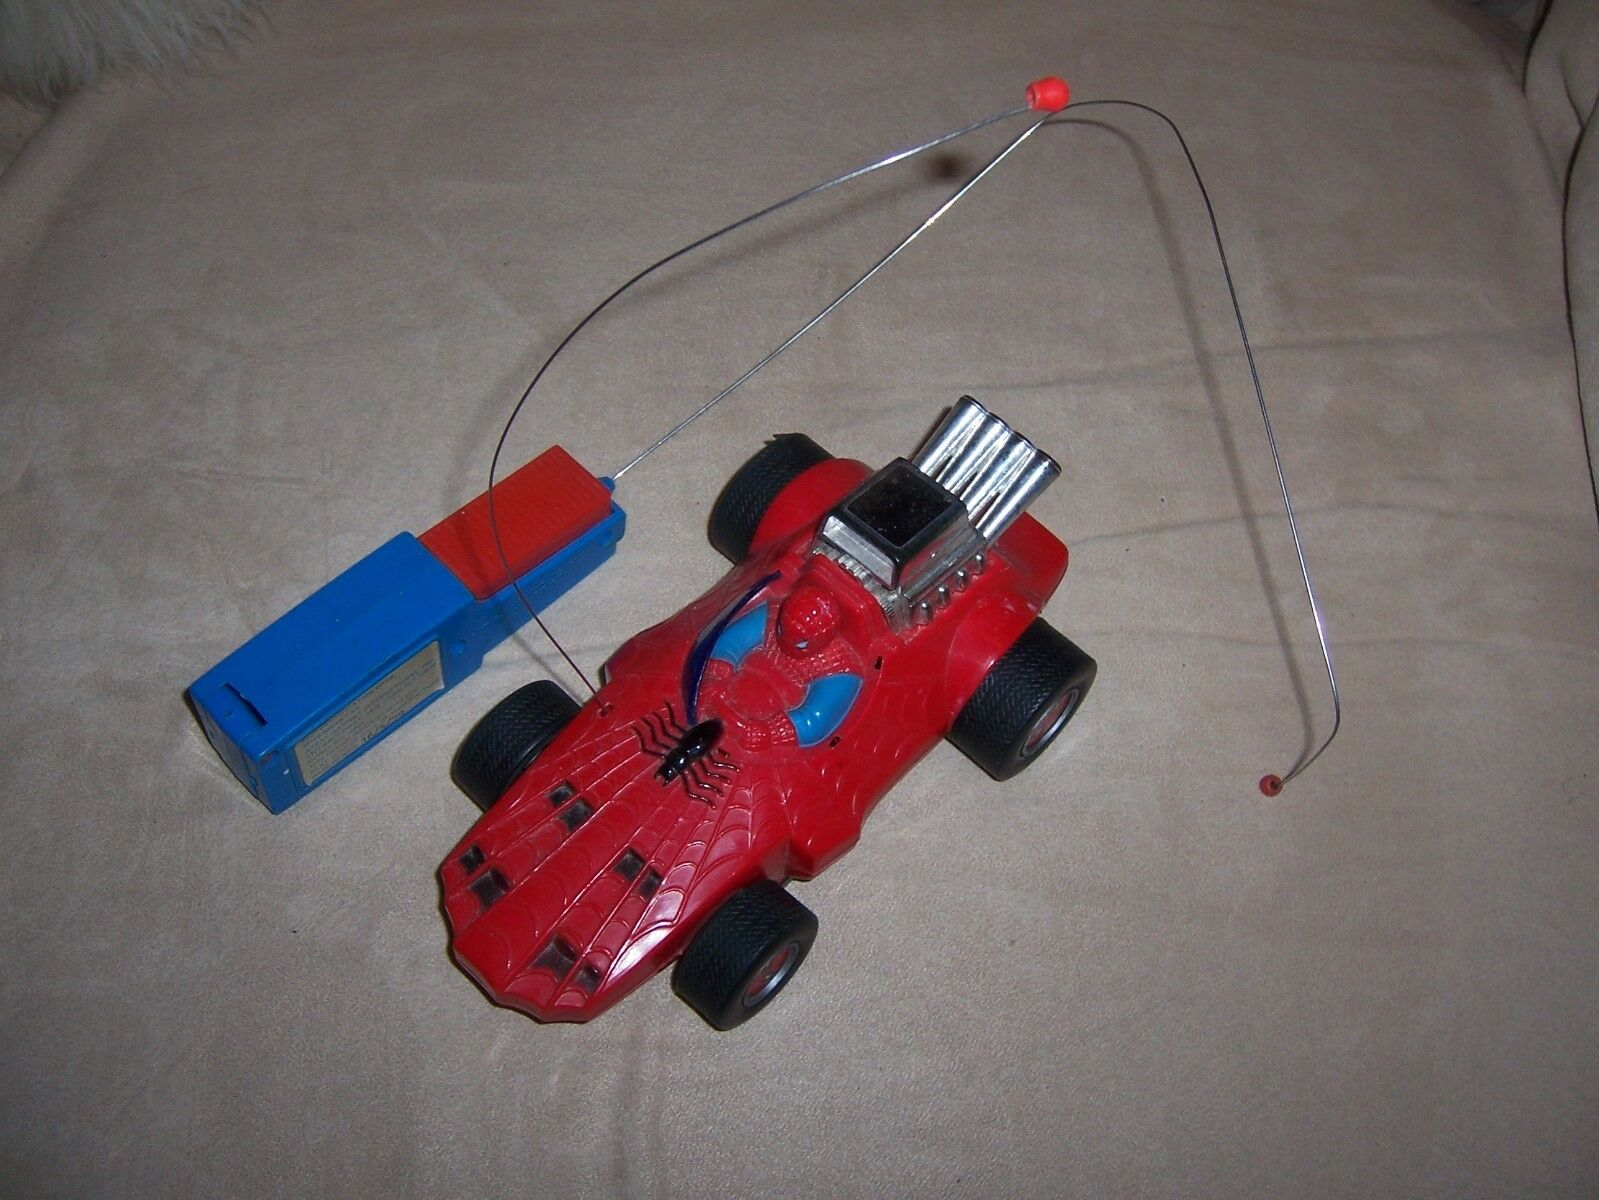 Jahrgang 1977 spiderman ferngesteuertes auto fahrzeug marvel - comics spider - man